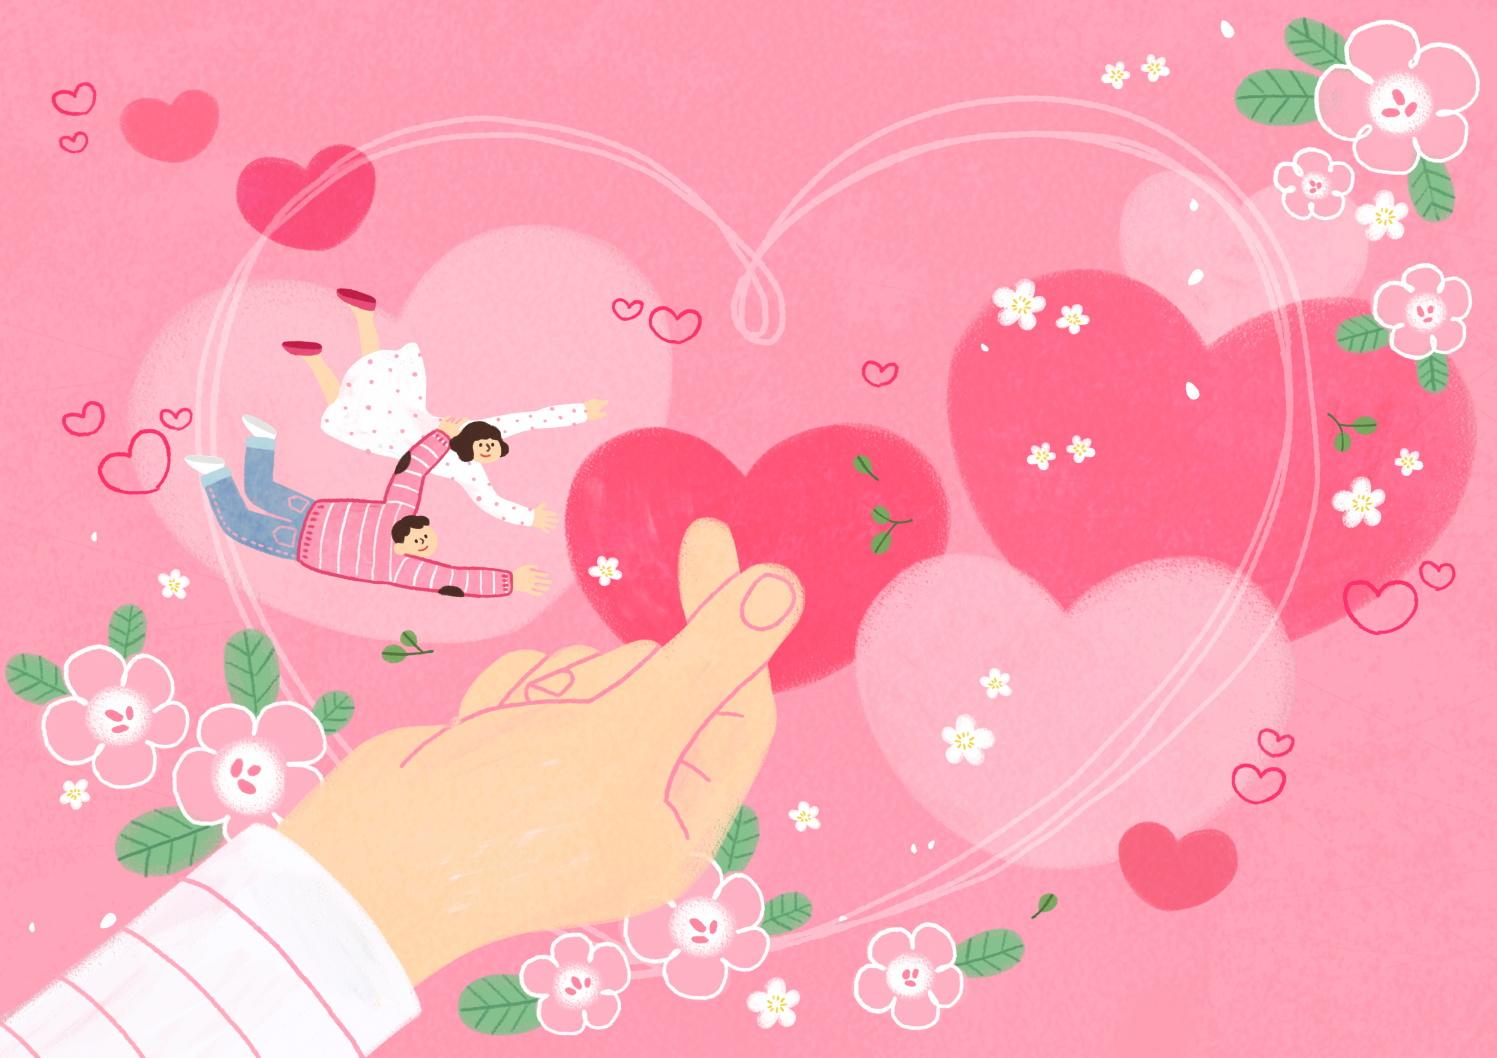 12款情人节七夕情侣手绘插画海报传单设计PSD素材 Valentines Day Couple Hand Drawn Illustration插图5